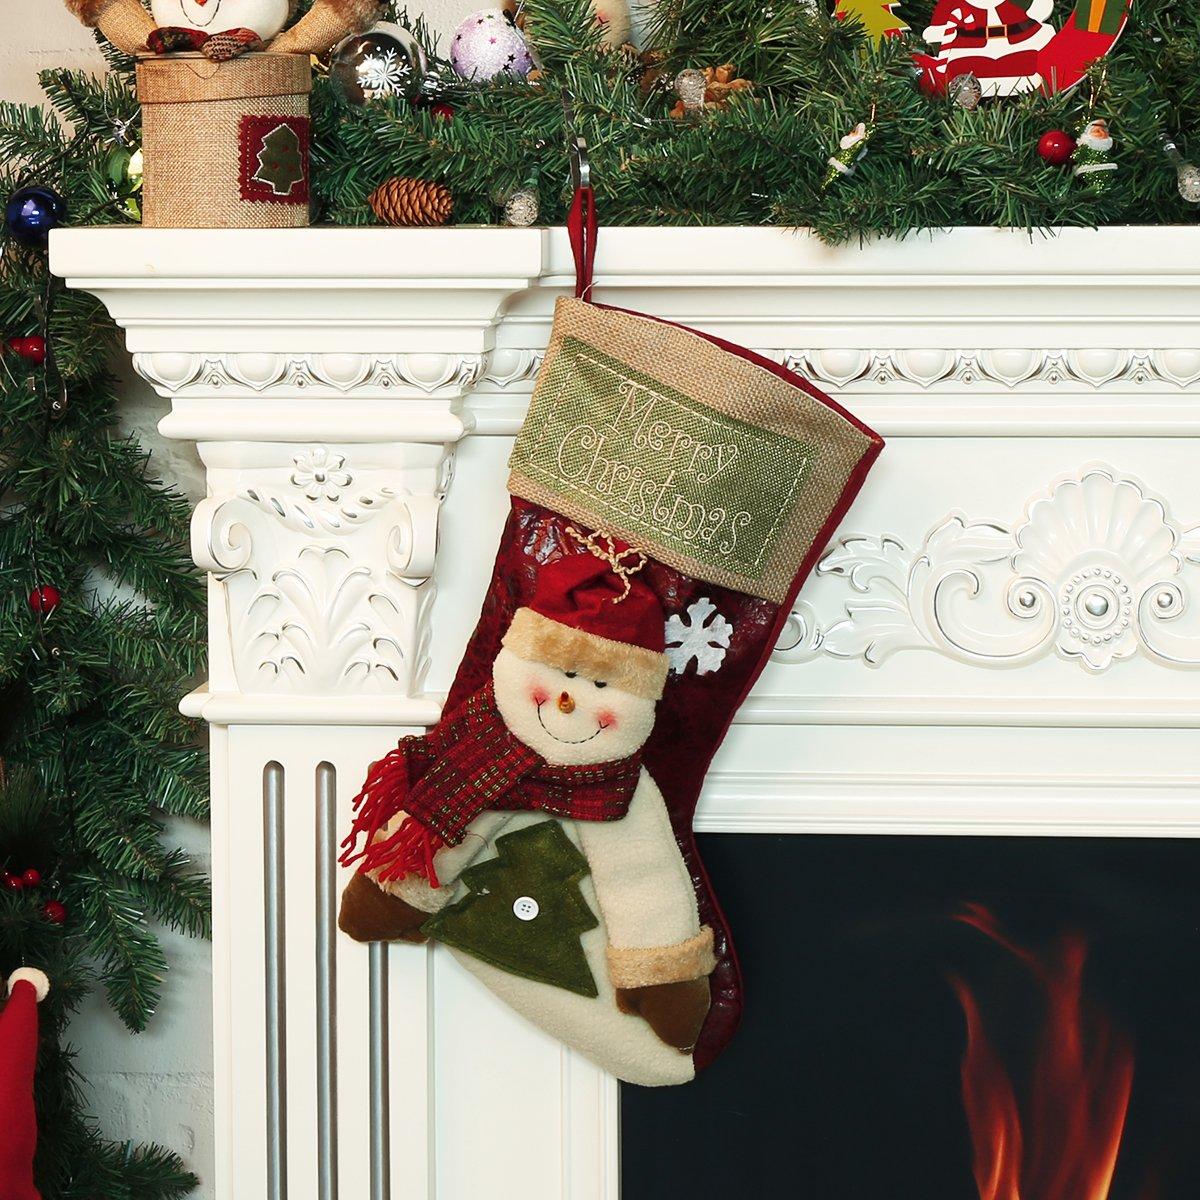 Christmas Stocking, Moonmini 3D Big Size Xmas Socks Classic Cute Christmas Hanging Decoration Stockings - Snowman